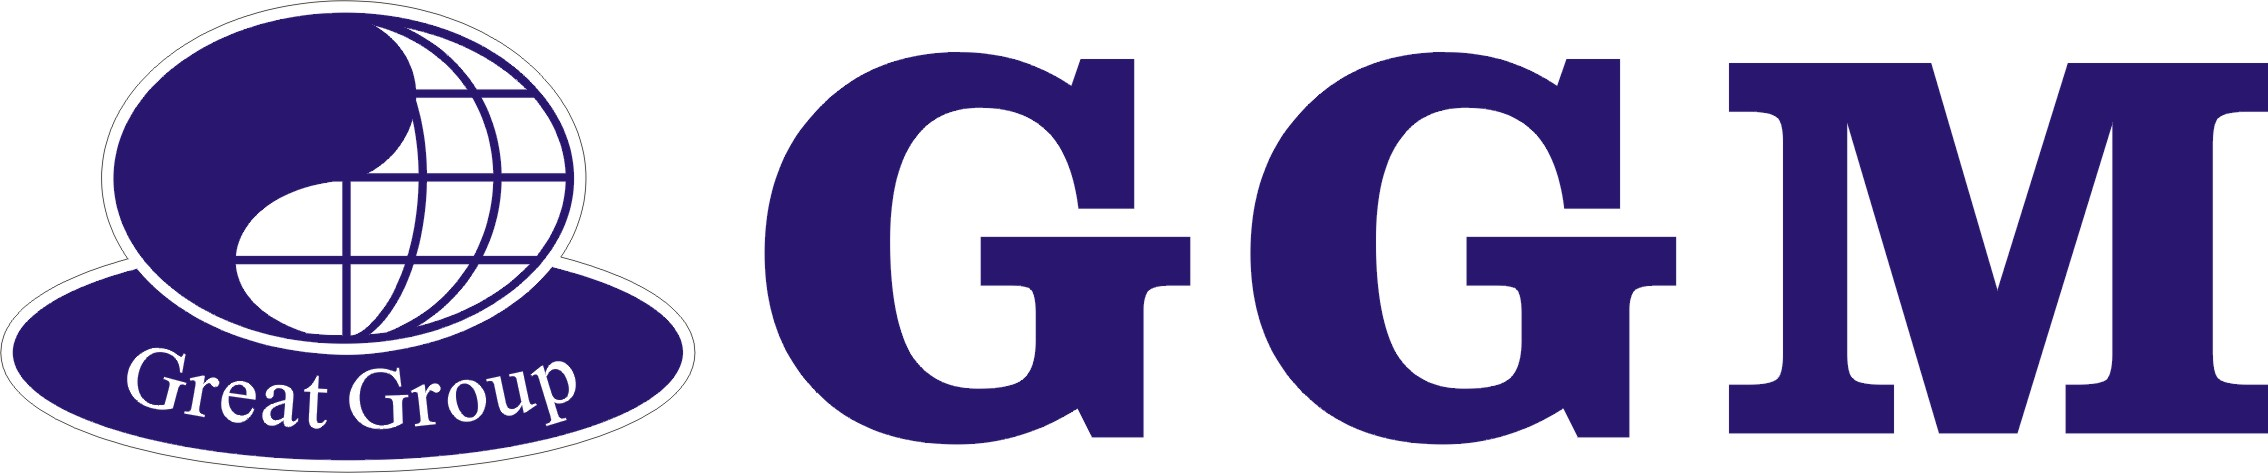 GREAT GROUP MEDICAL CO., LTD.-Logo